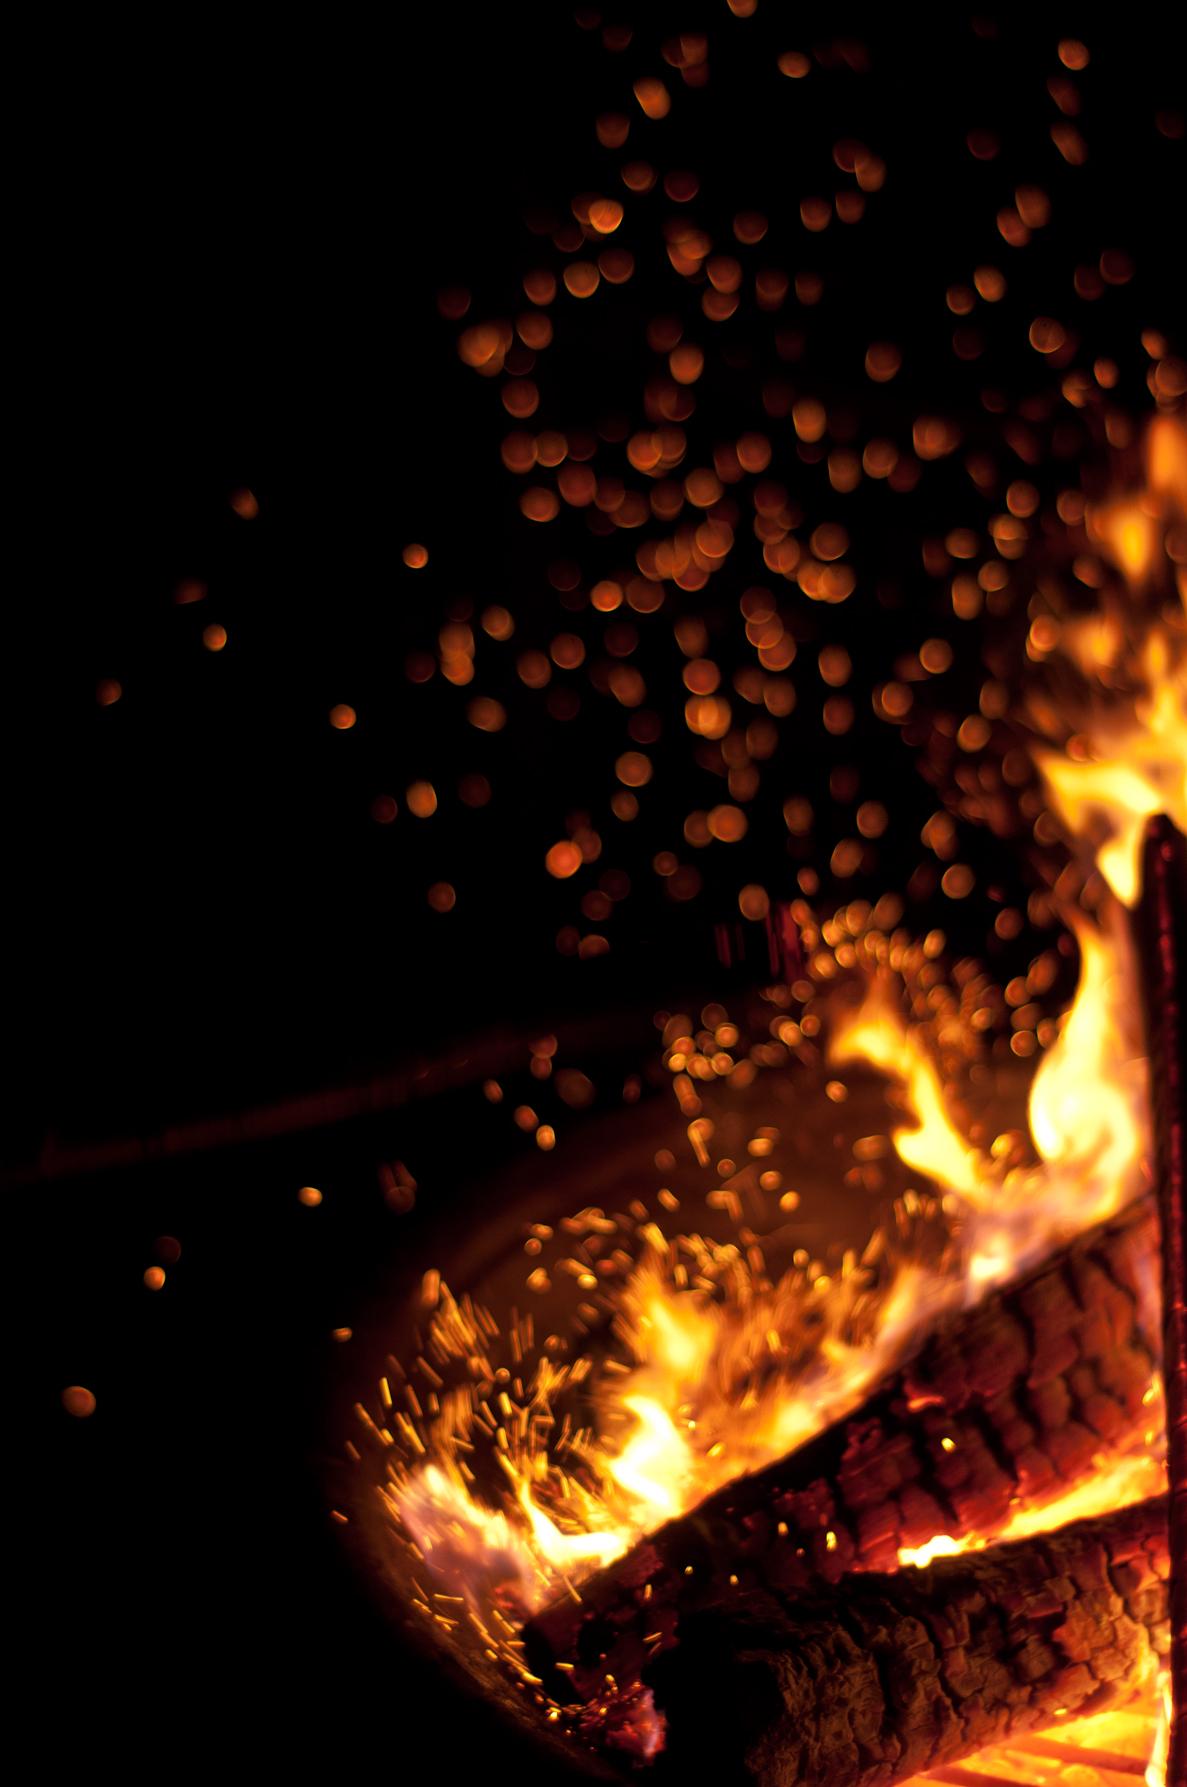 fire | Abigail Thompson Photography